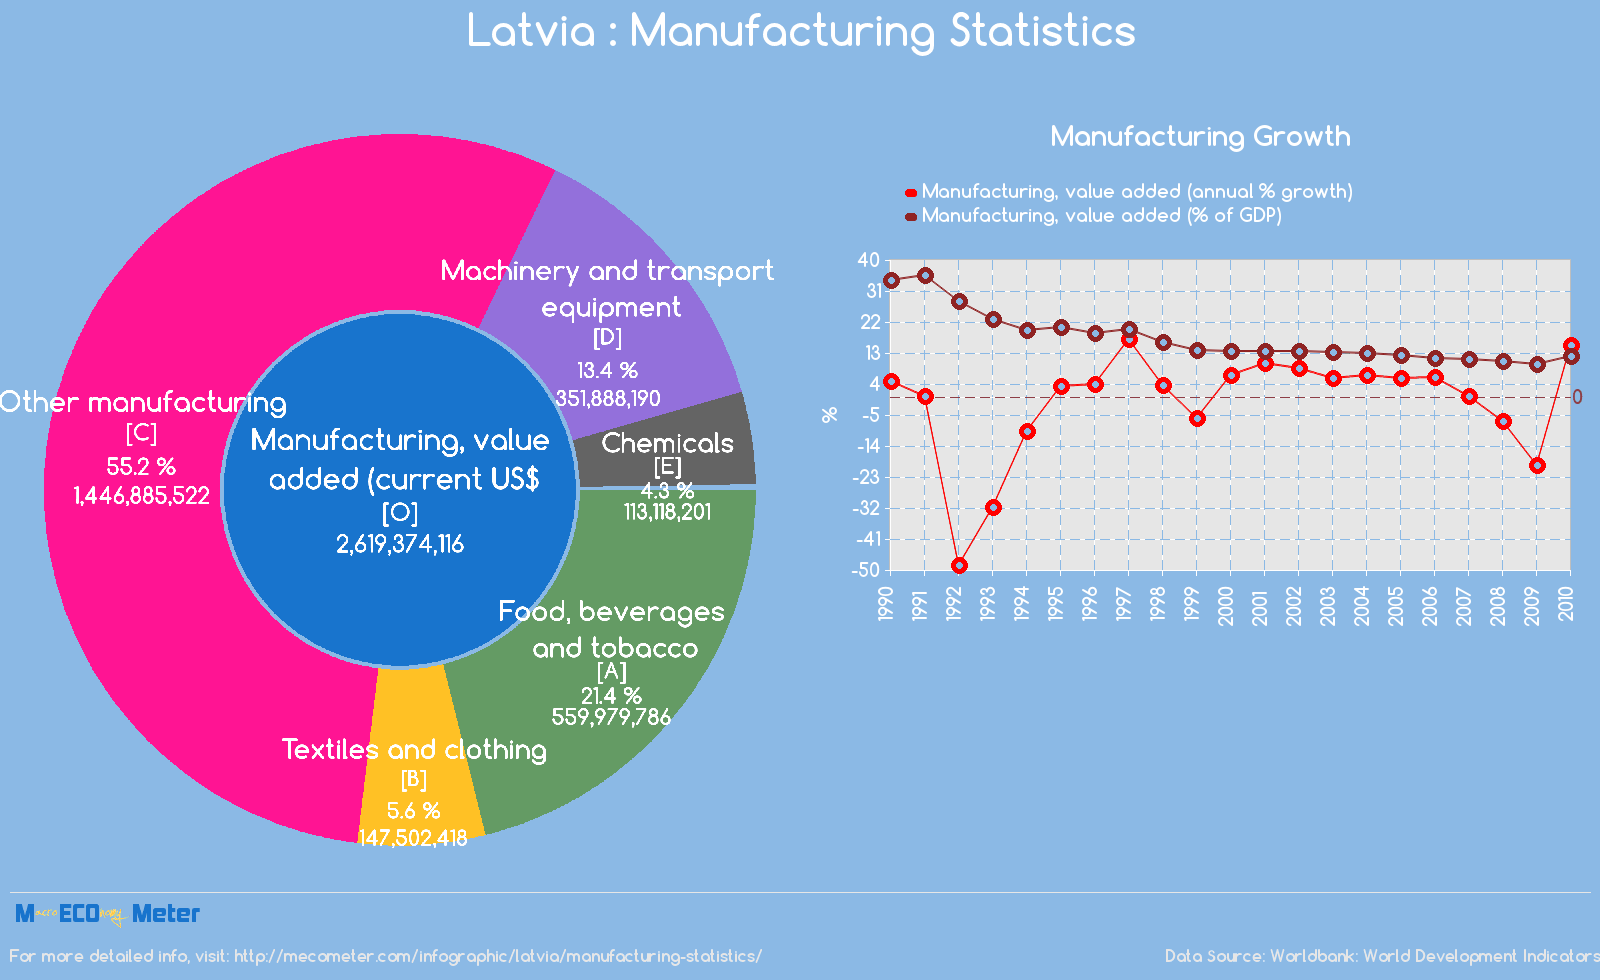 Latvia : Manufacturing Statistics